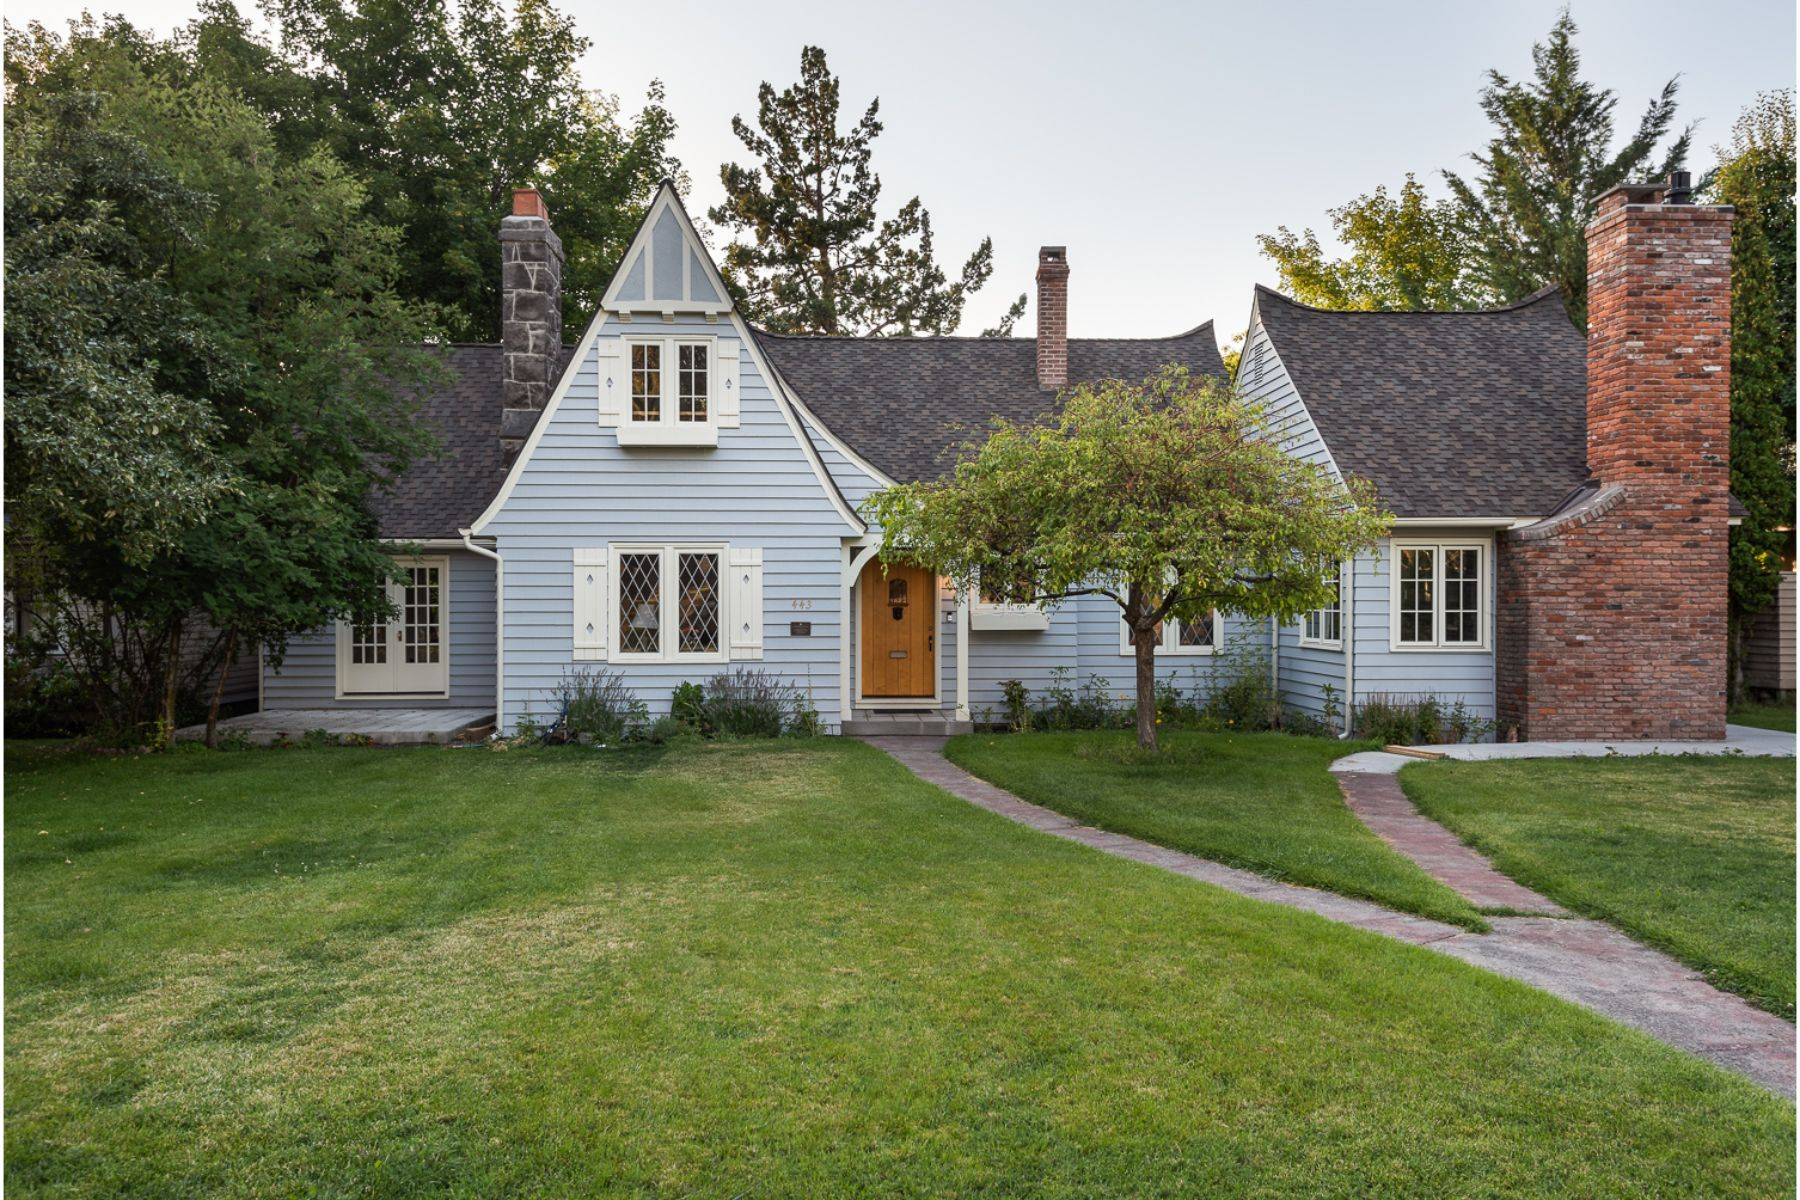 Other Residential Homes για την Πώληση στο 443 NW Congress Street Bend, OR 97703 Bend, Ορεγκον 97703 Ηνωμένες Πολιτείες